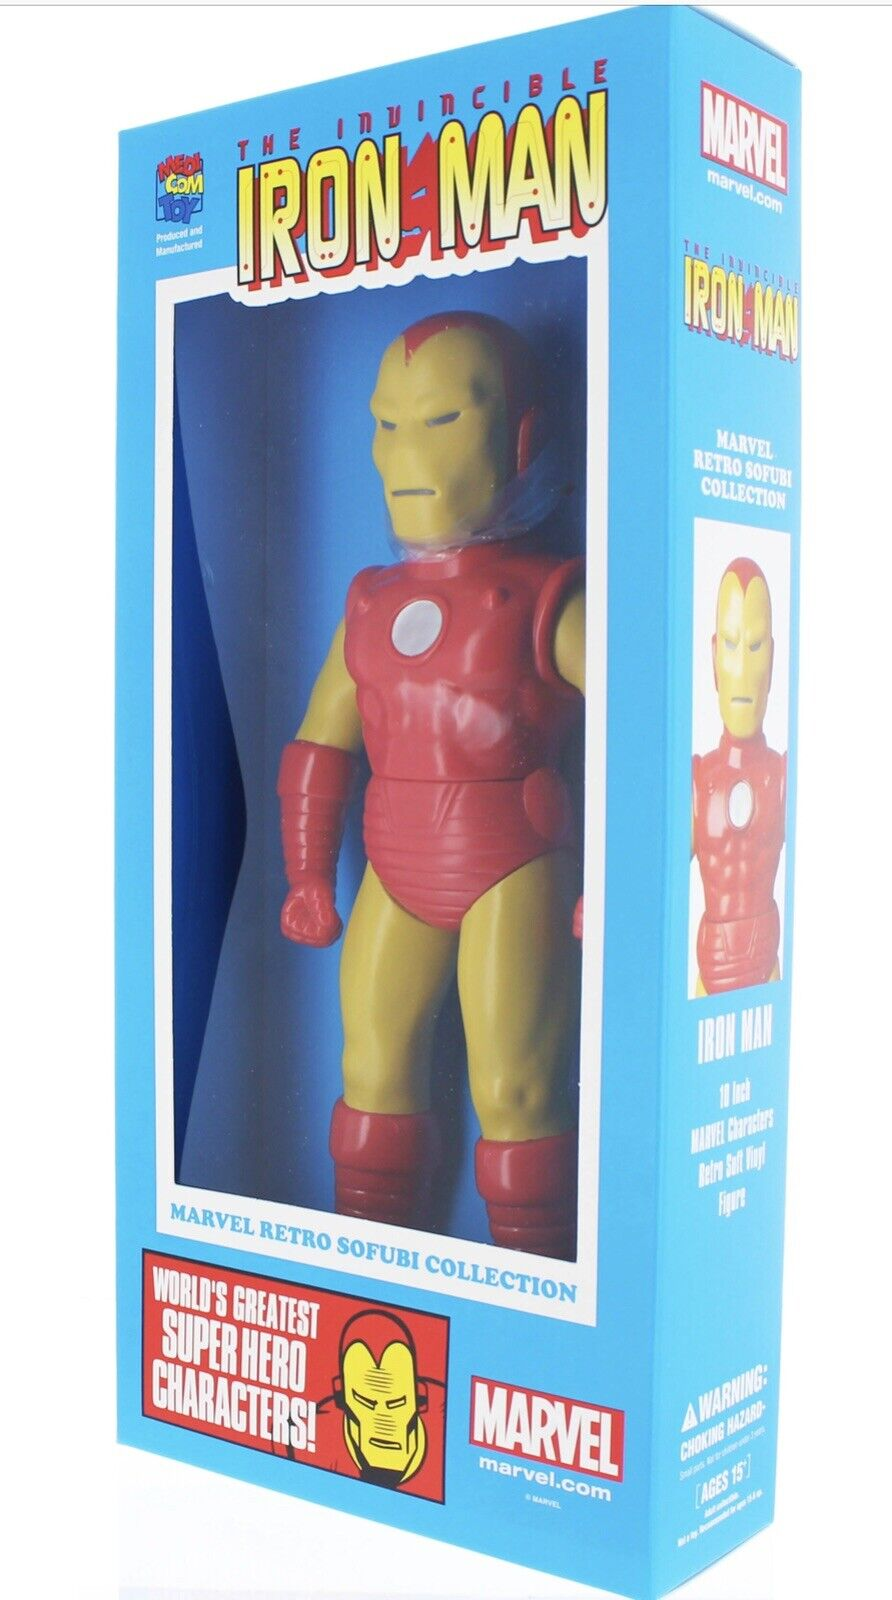 MEDICOM TOY Marvel Comics Retro Sofubi Collection IRON MAN 10   Vinyl figure MIB